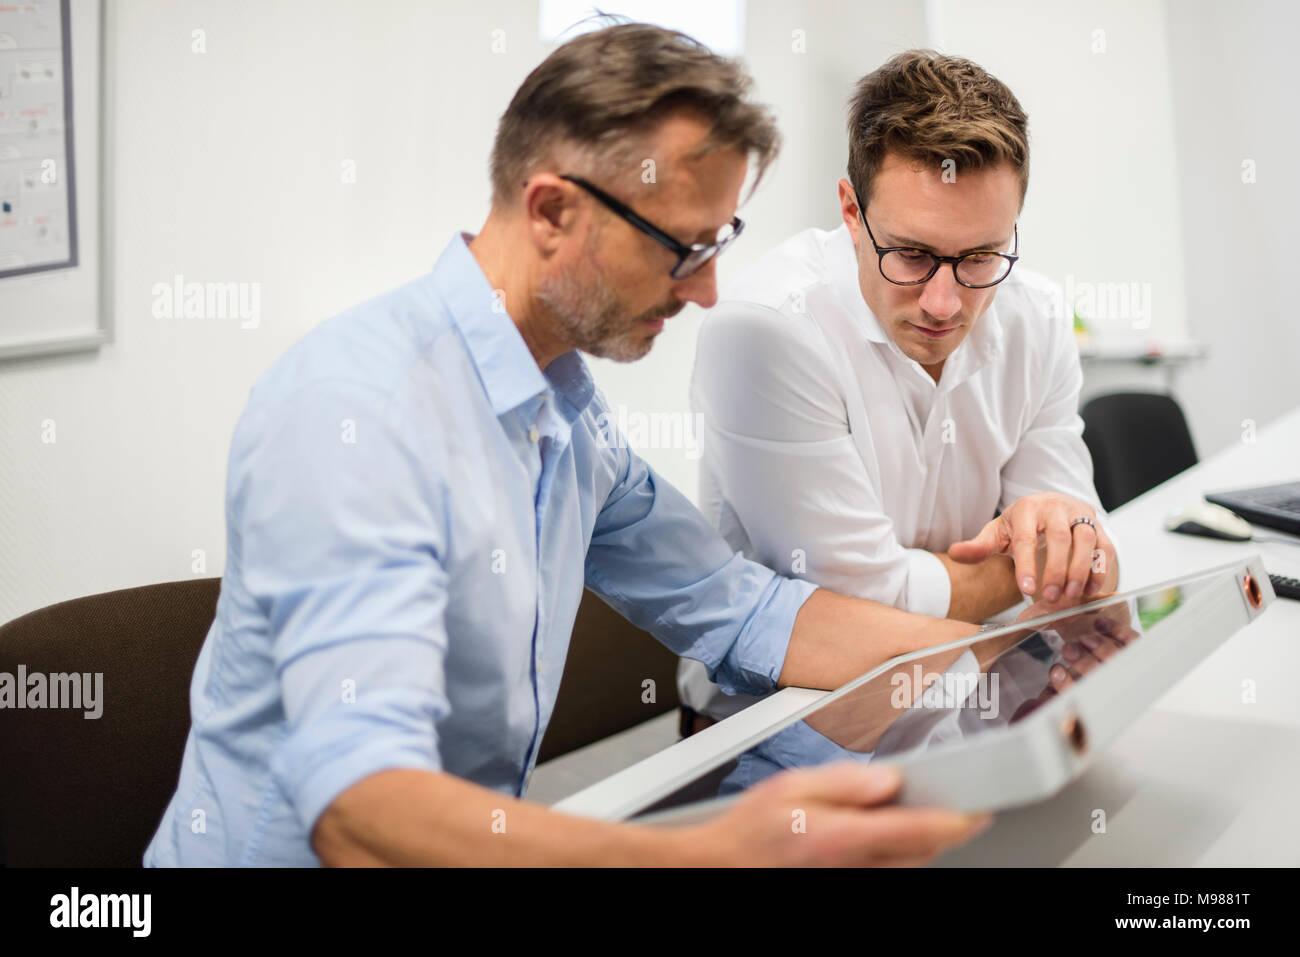 Two businessmen examining solar panel on desk in office - Stock Image